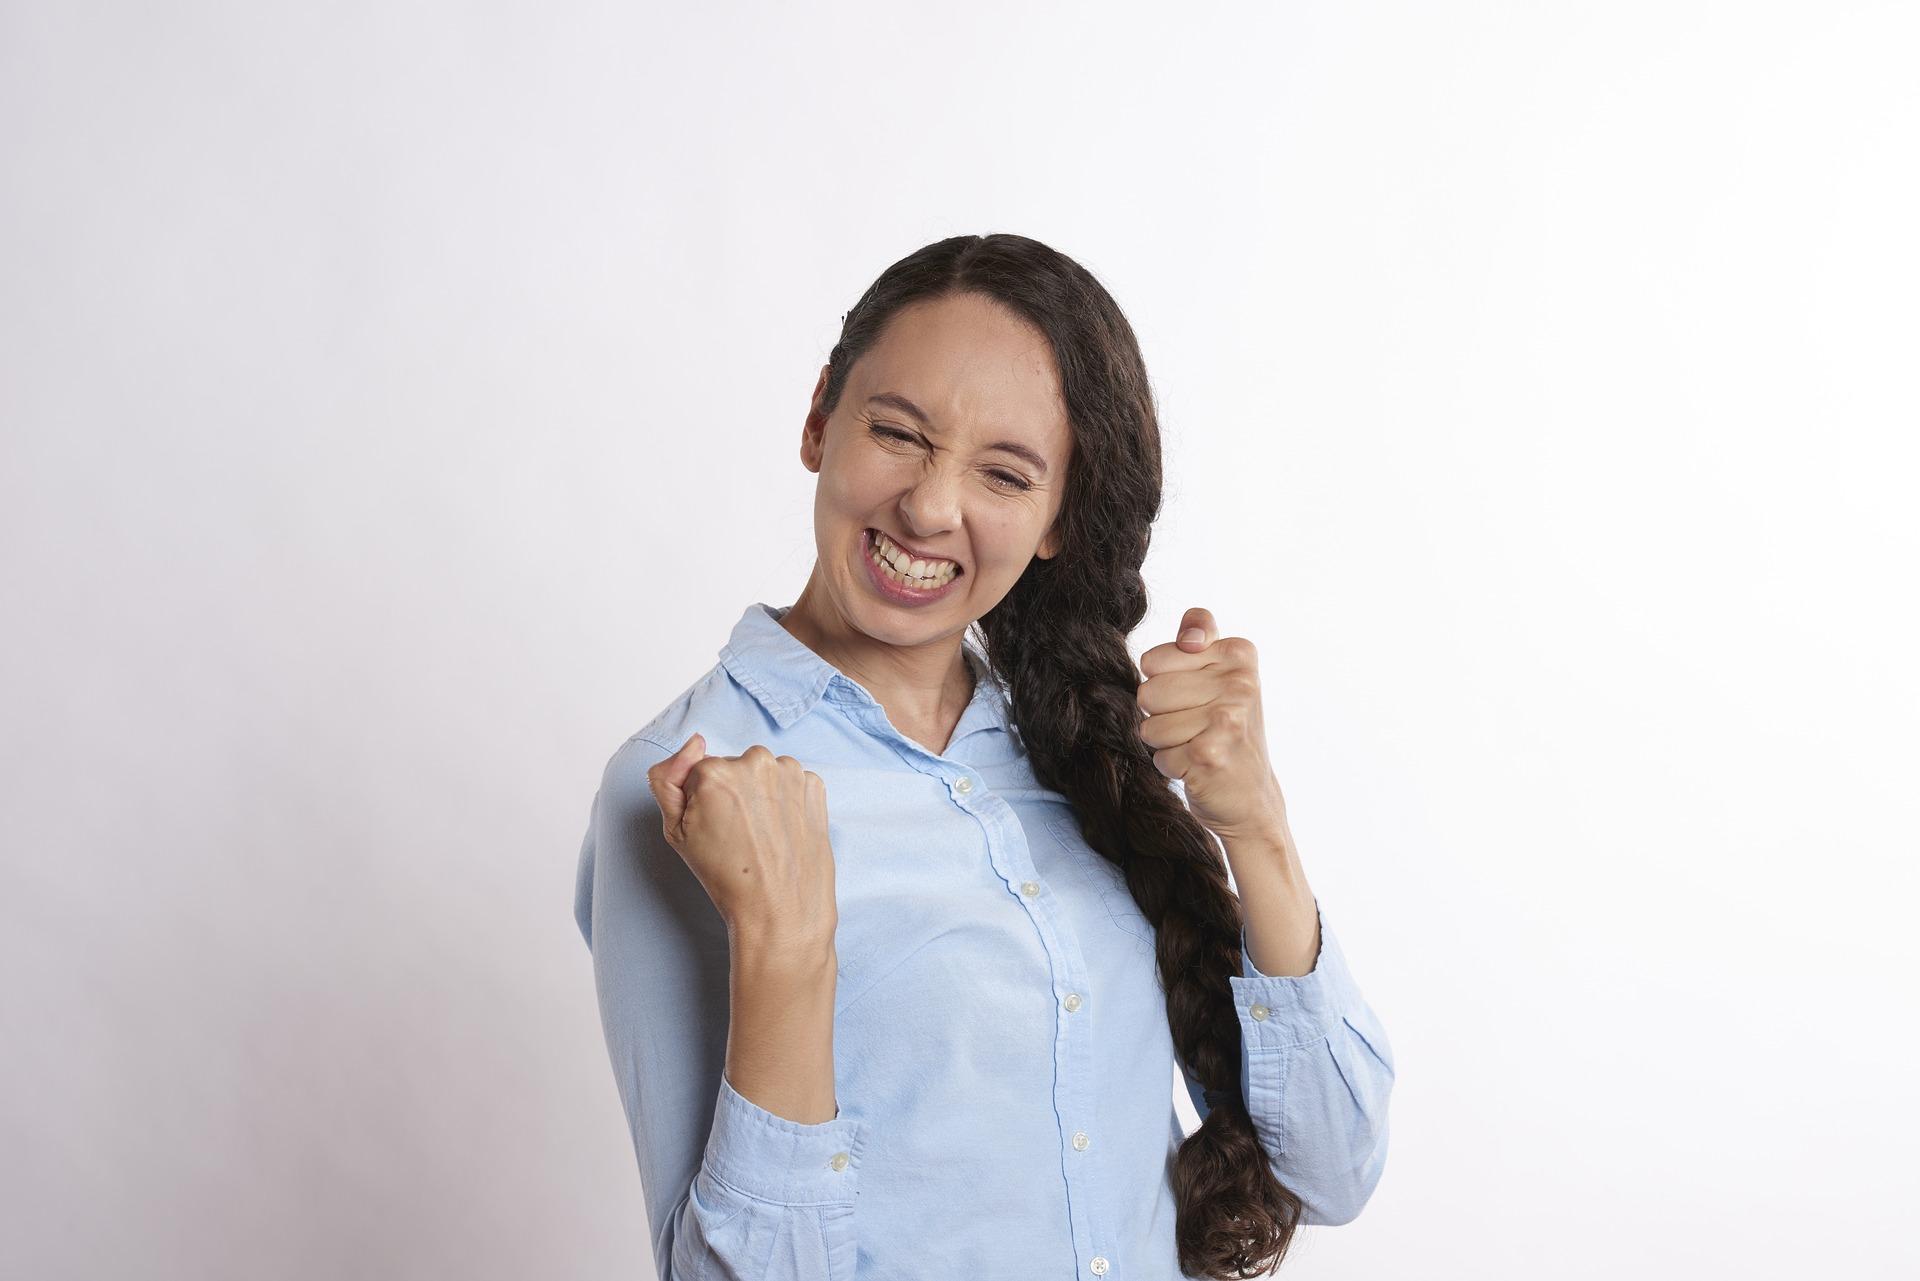 7 Tips To Improve Your Self Esteem